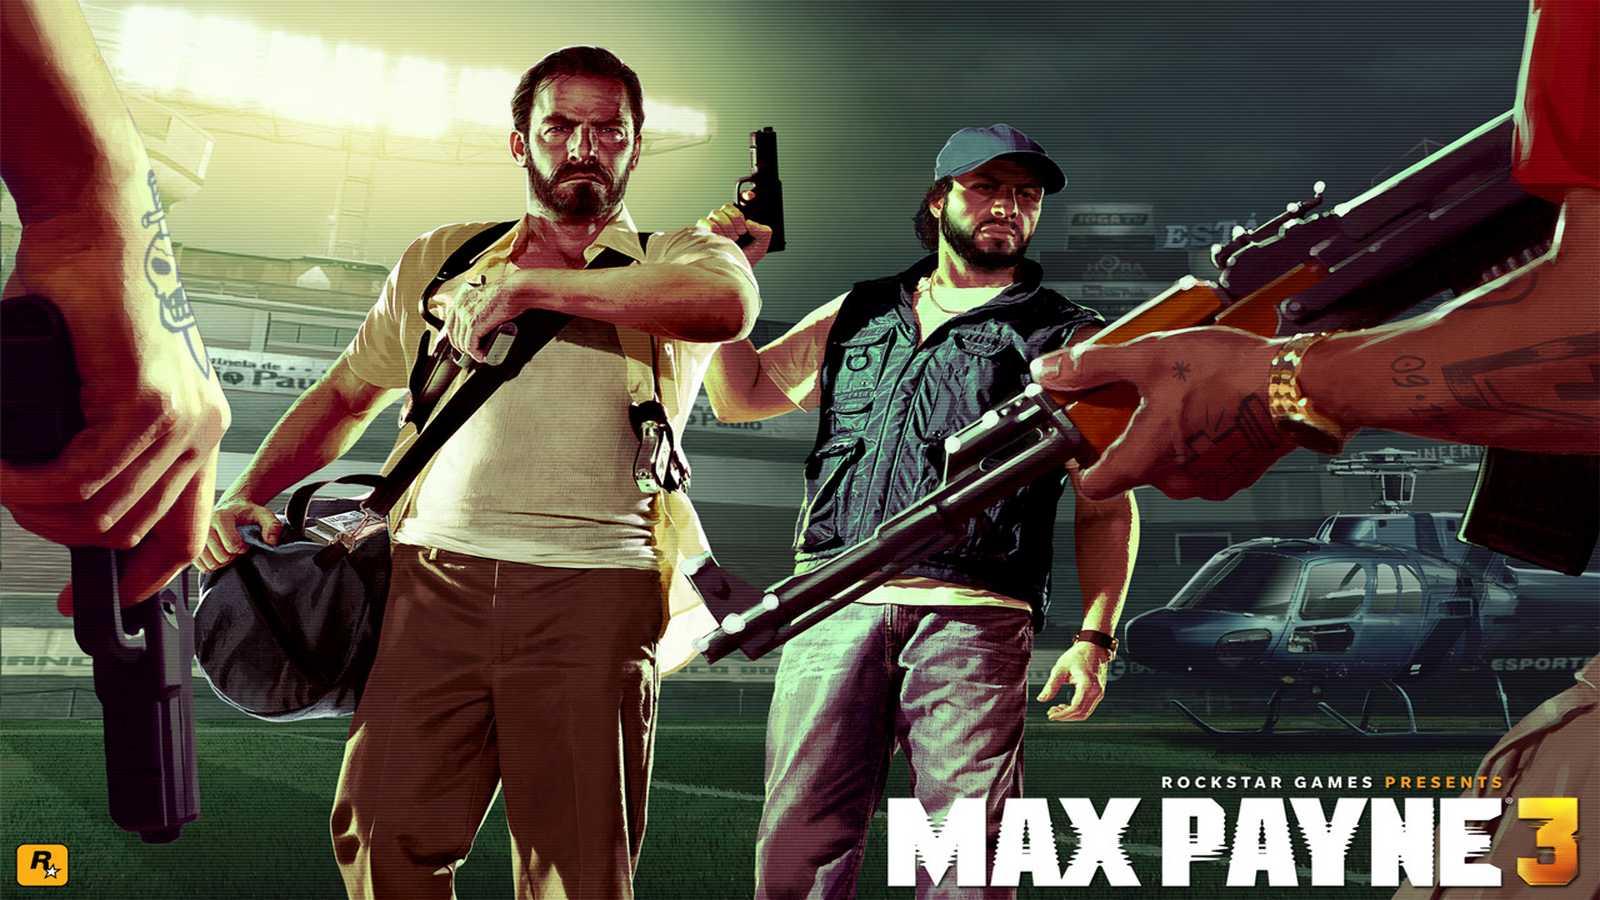 http://3.bp.blogspot.com/-sIfcyoJIuYA/UNdLE5UBtoI/AAAAAAAAqls/LutNzx8_vLE/s1600/1600x900+Wallpaper+-+Max+Payne+3+-+128646-max-payne-max-payne-3-black-box-repack.jpg